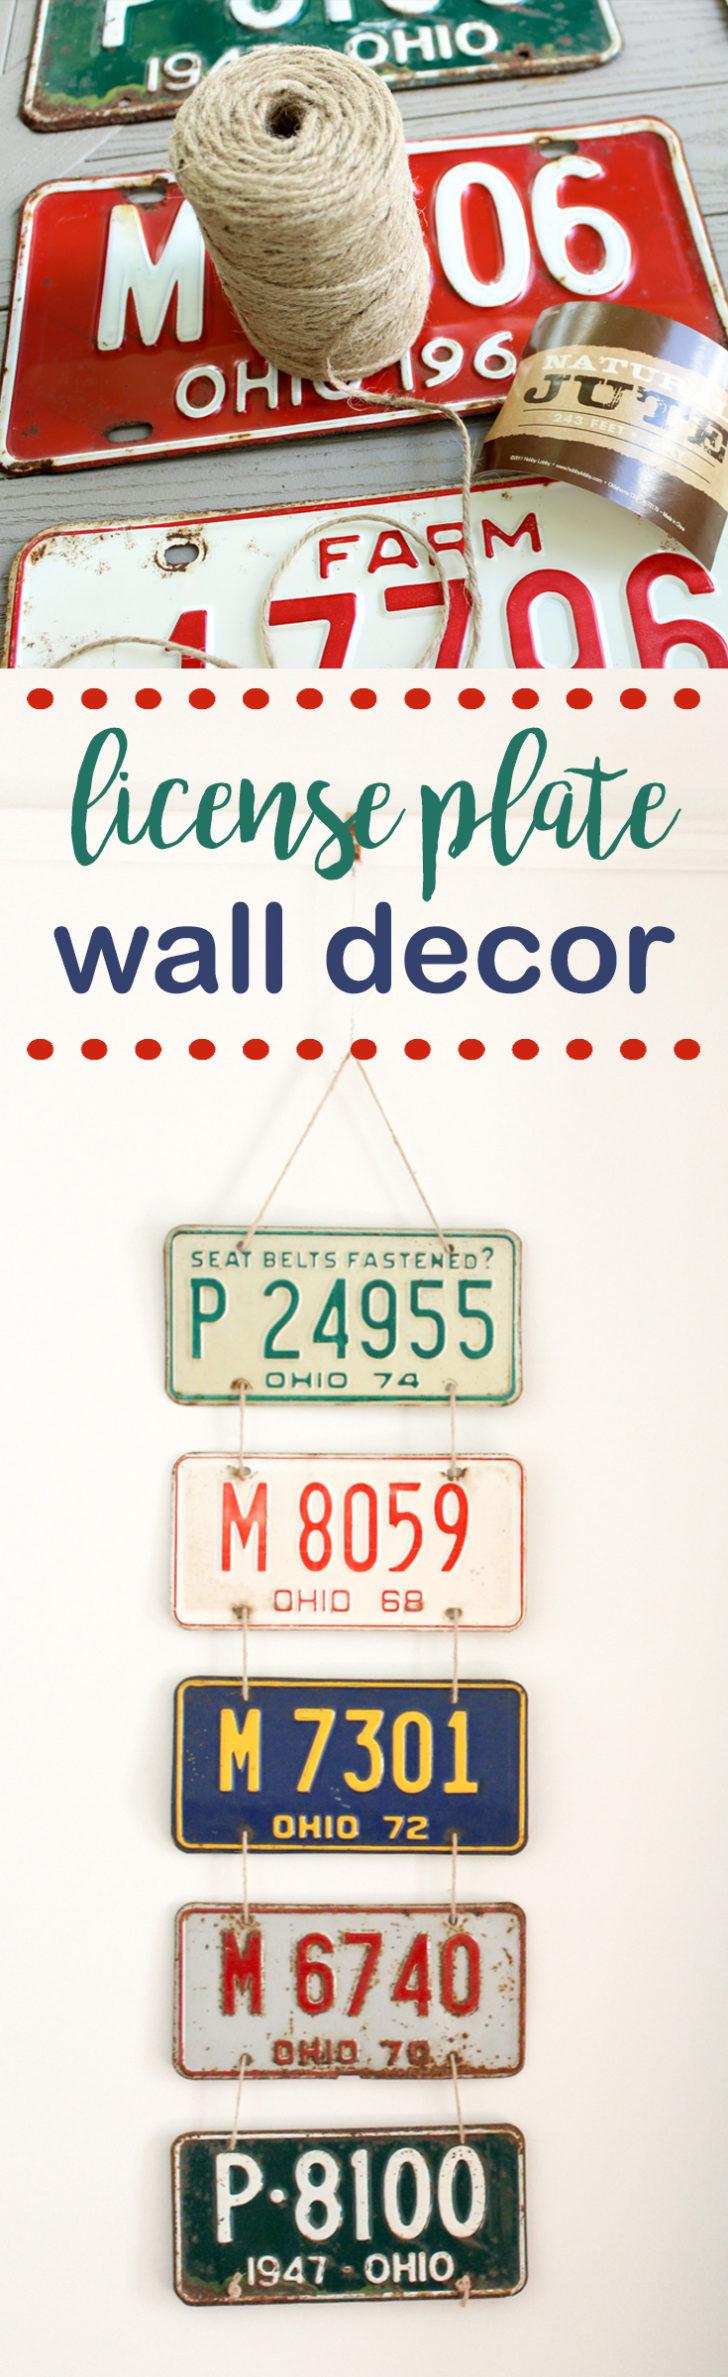 custom license plate wall decor